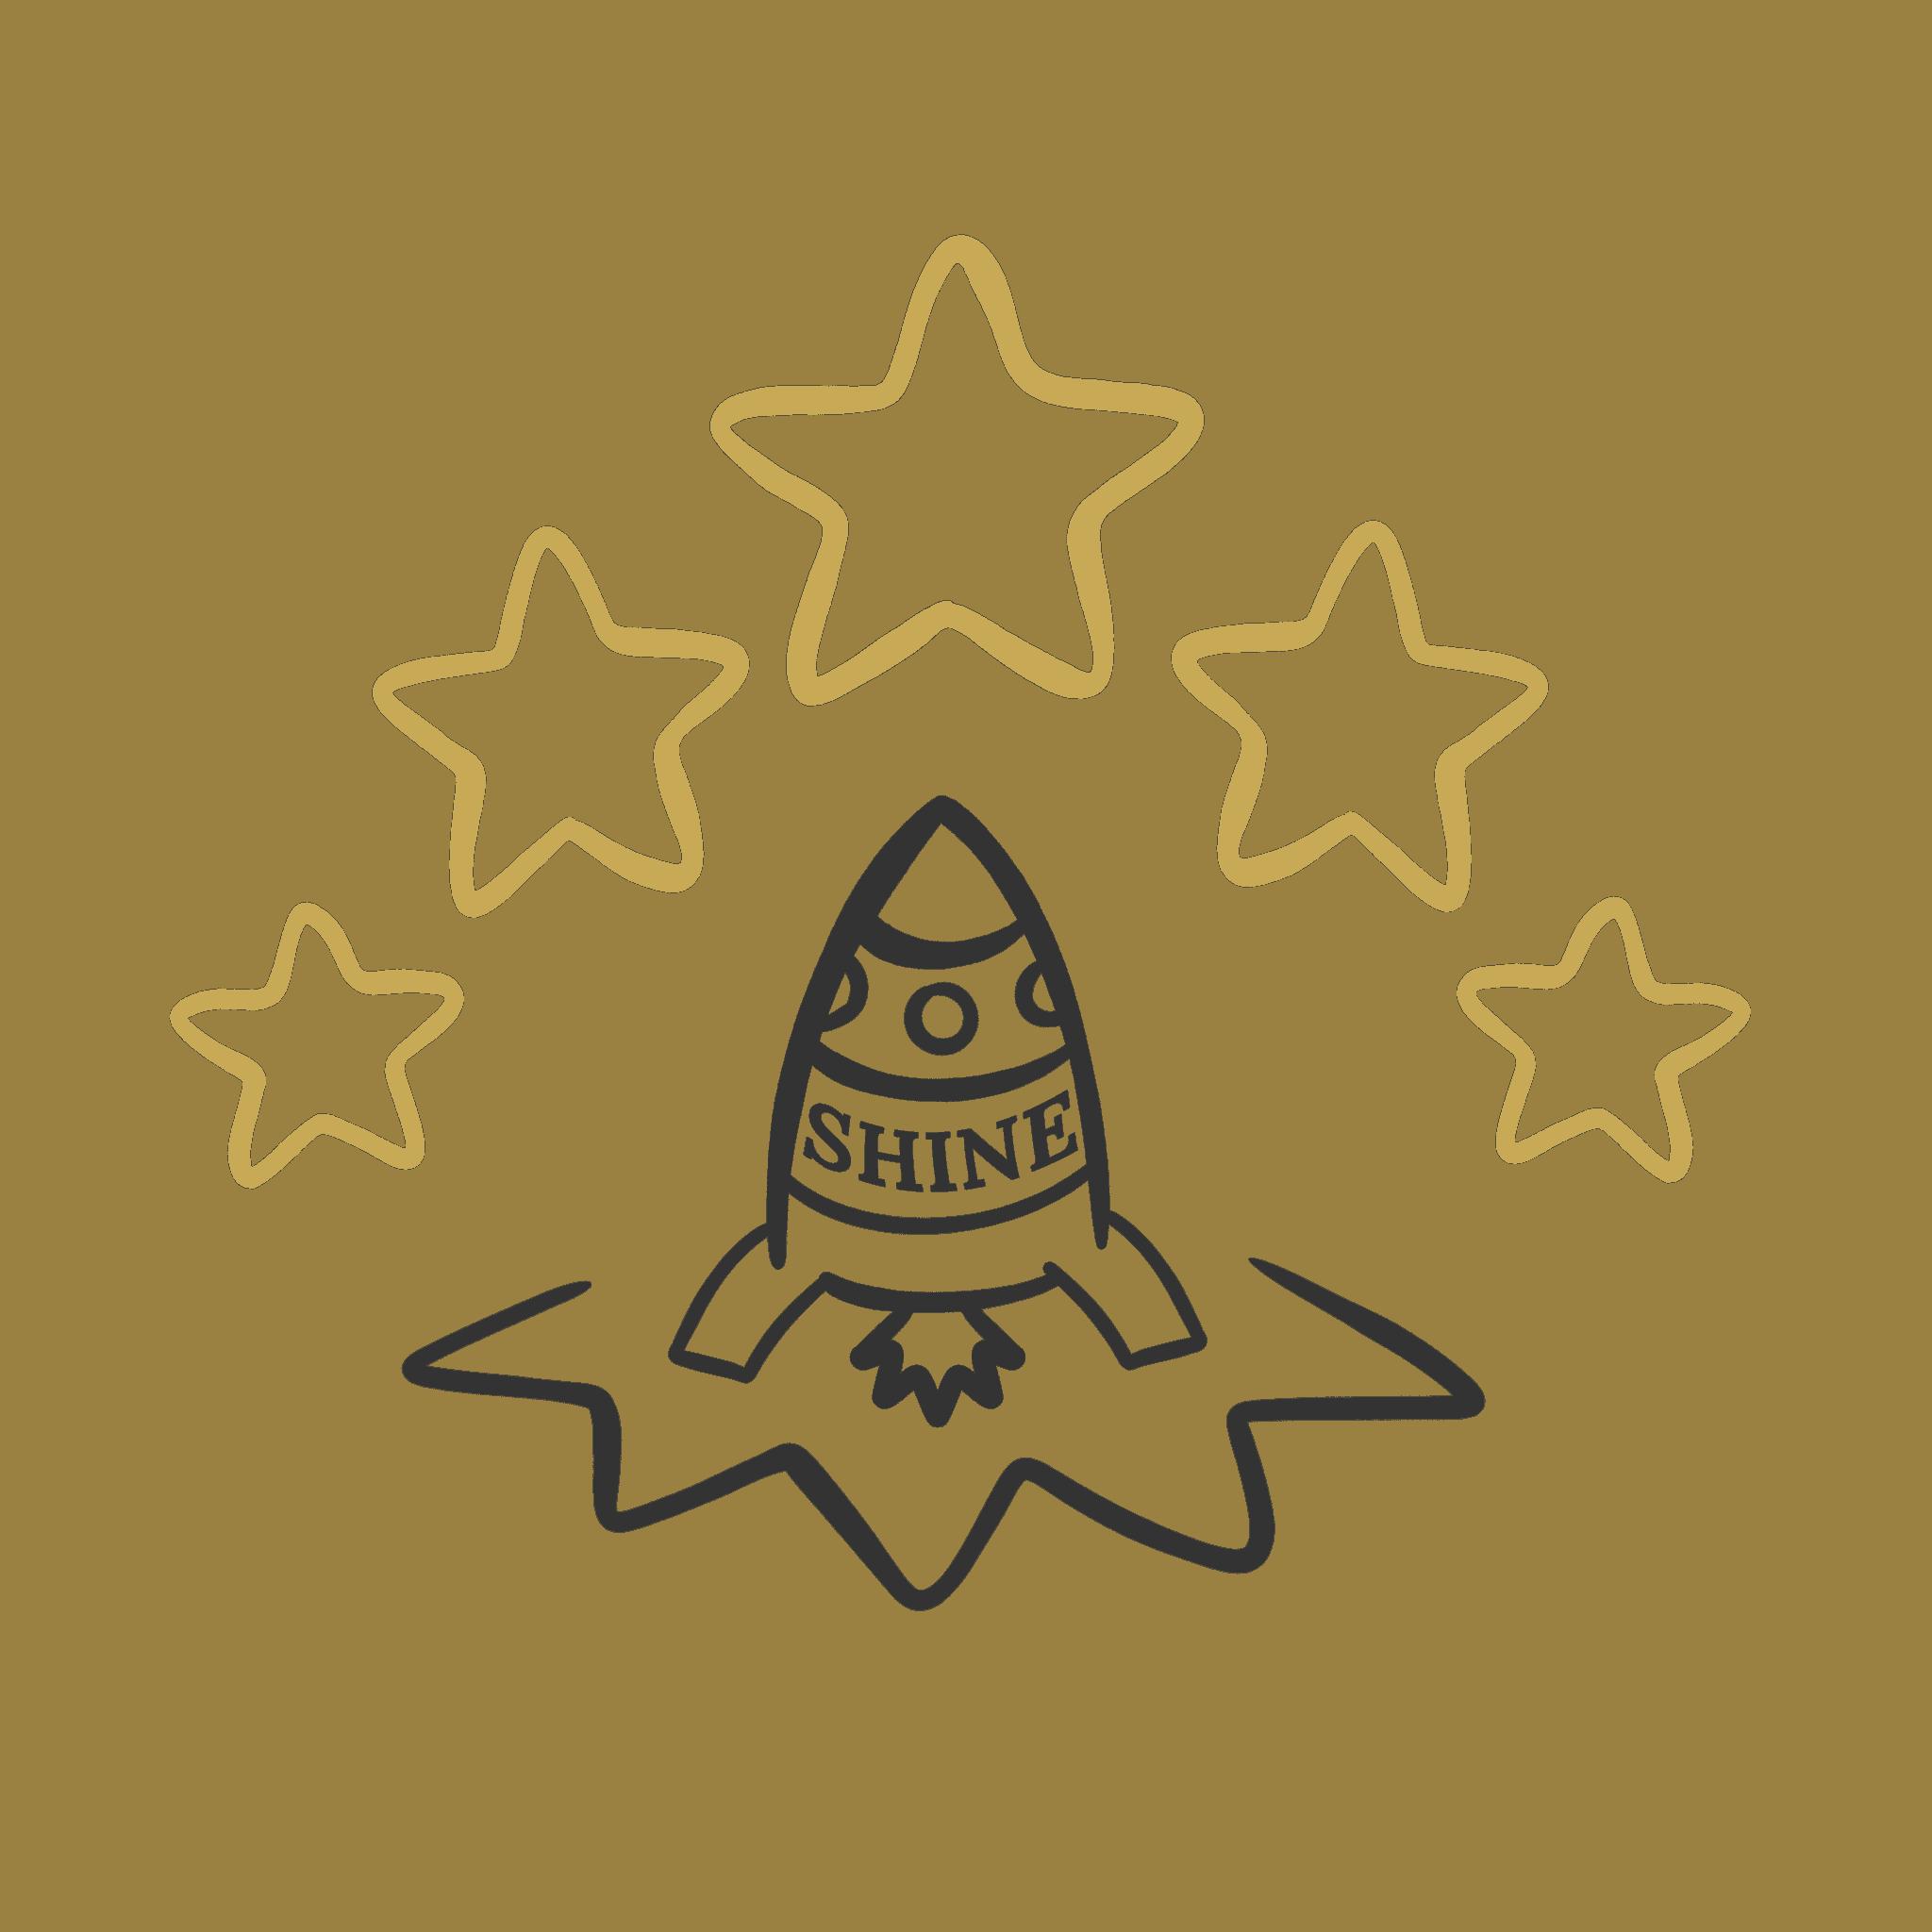 Icon_3 Shine Goud-Grijs